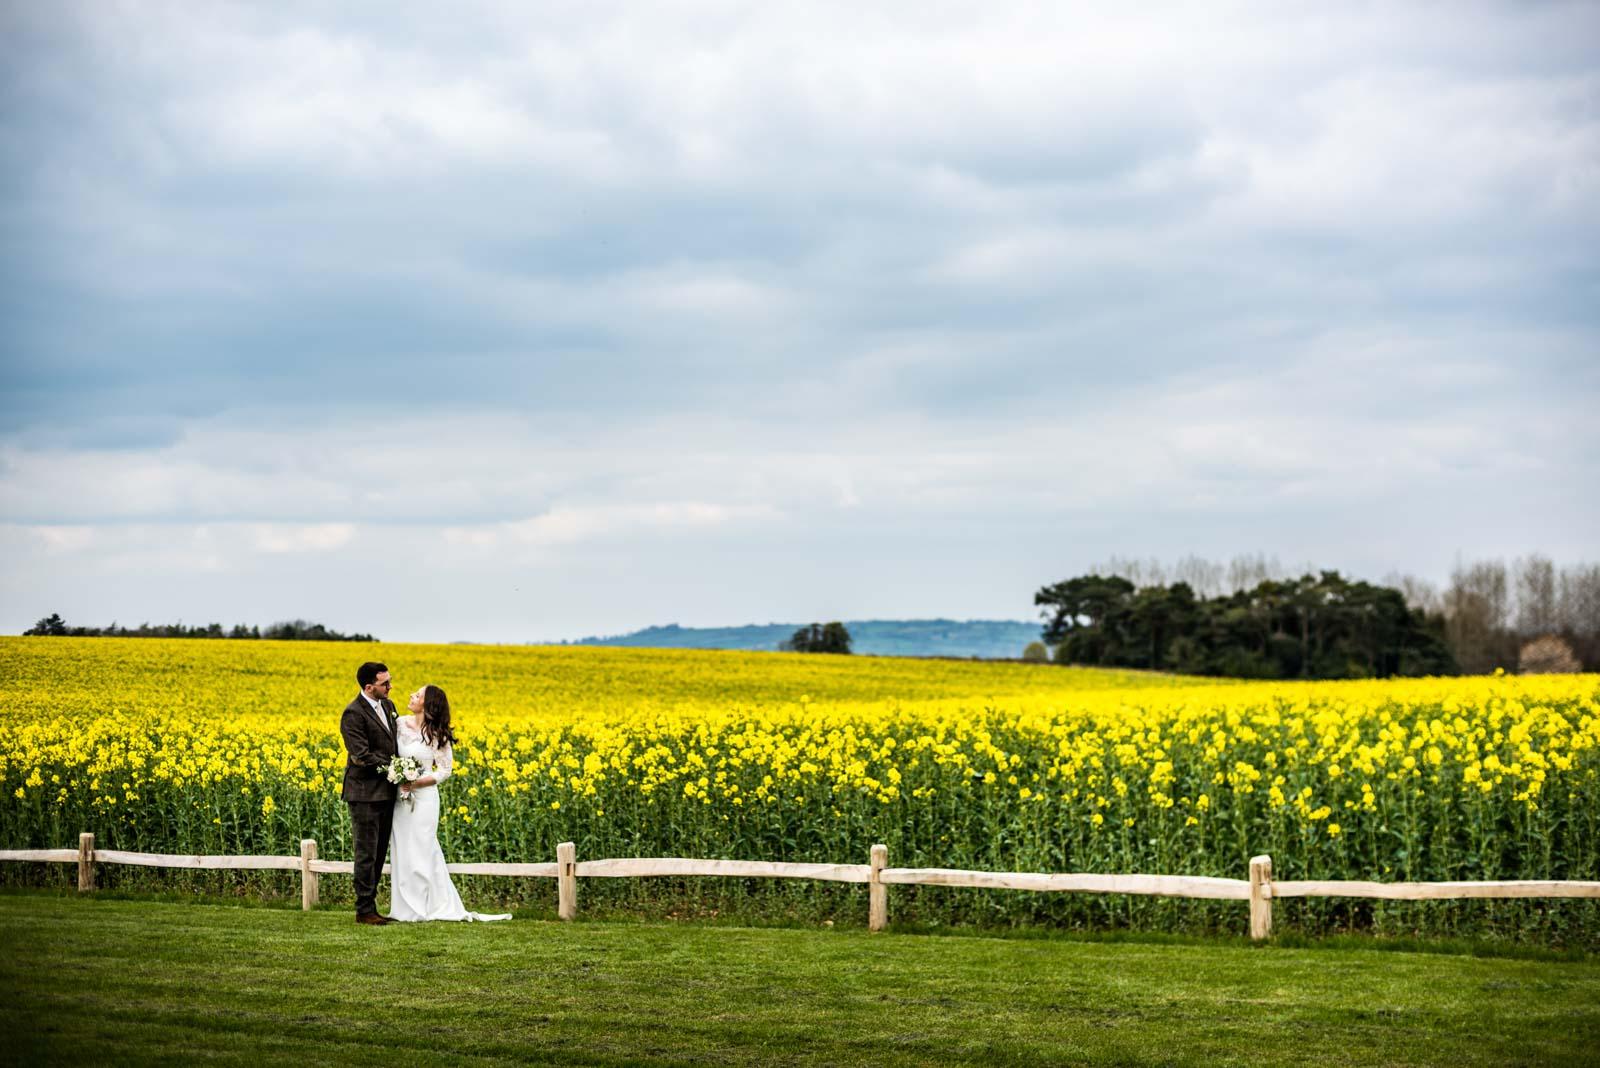 lapstone barn wedding photography joe and sarah 236 of 350